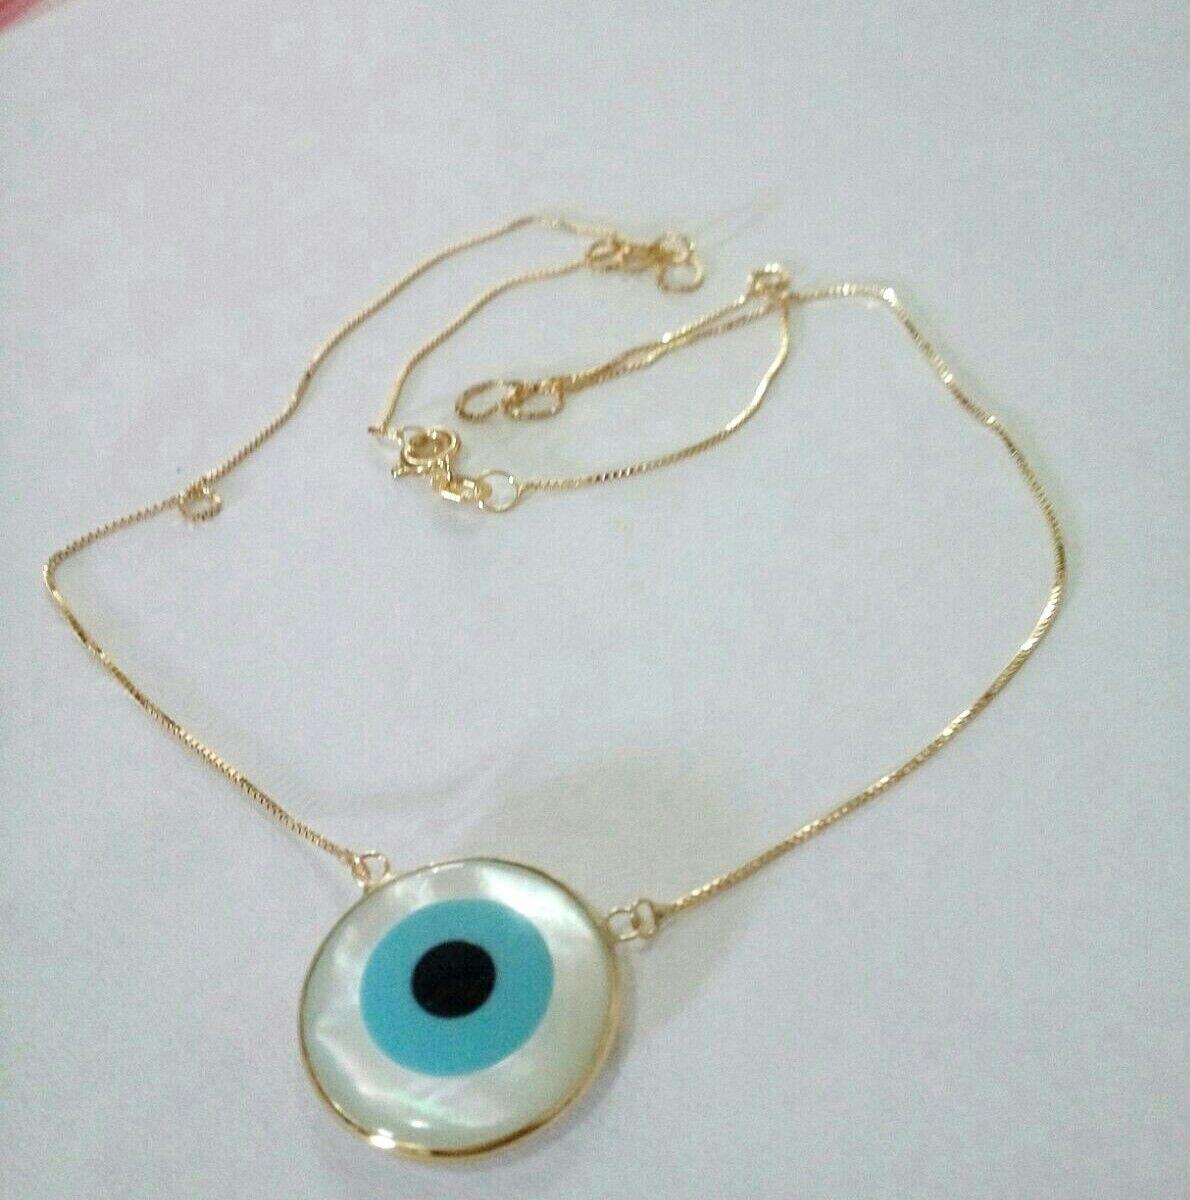 4fdfb4fa2188f Conjunto Colar E Pulseira Olho Grego Ouro 18k - R  750